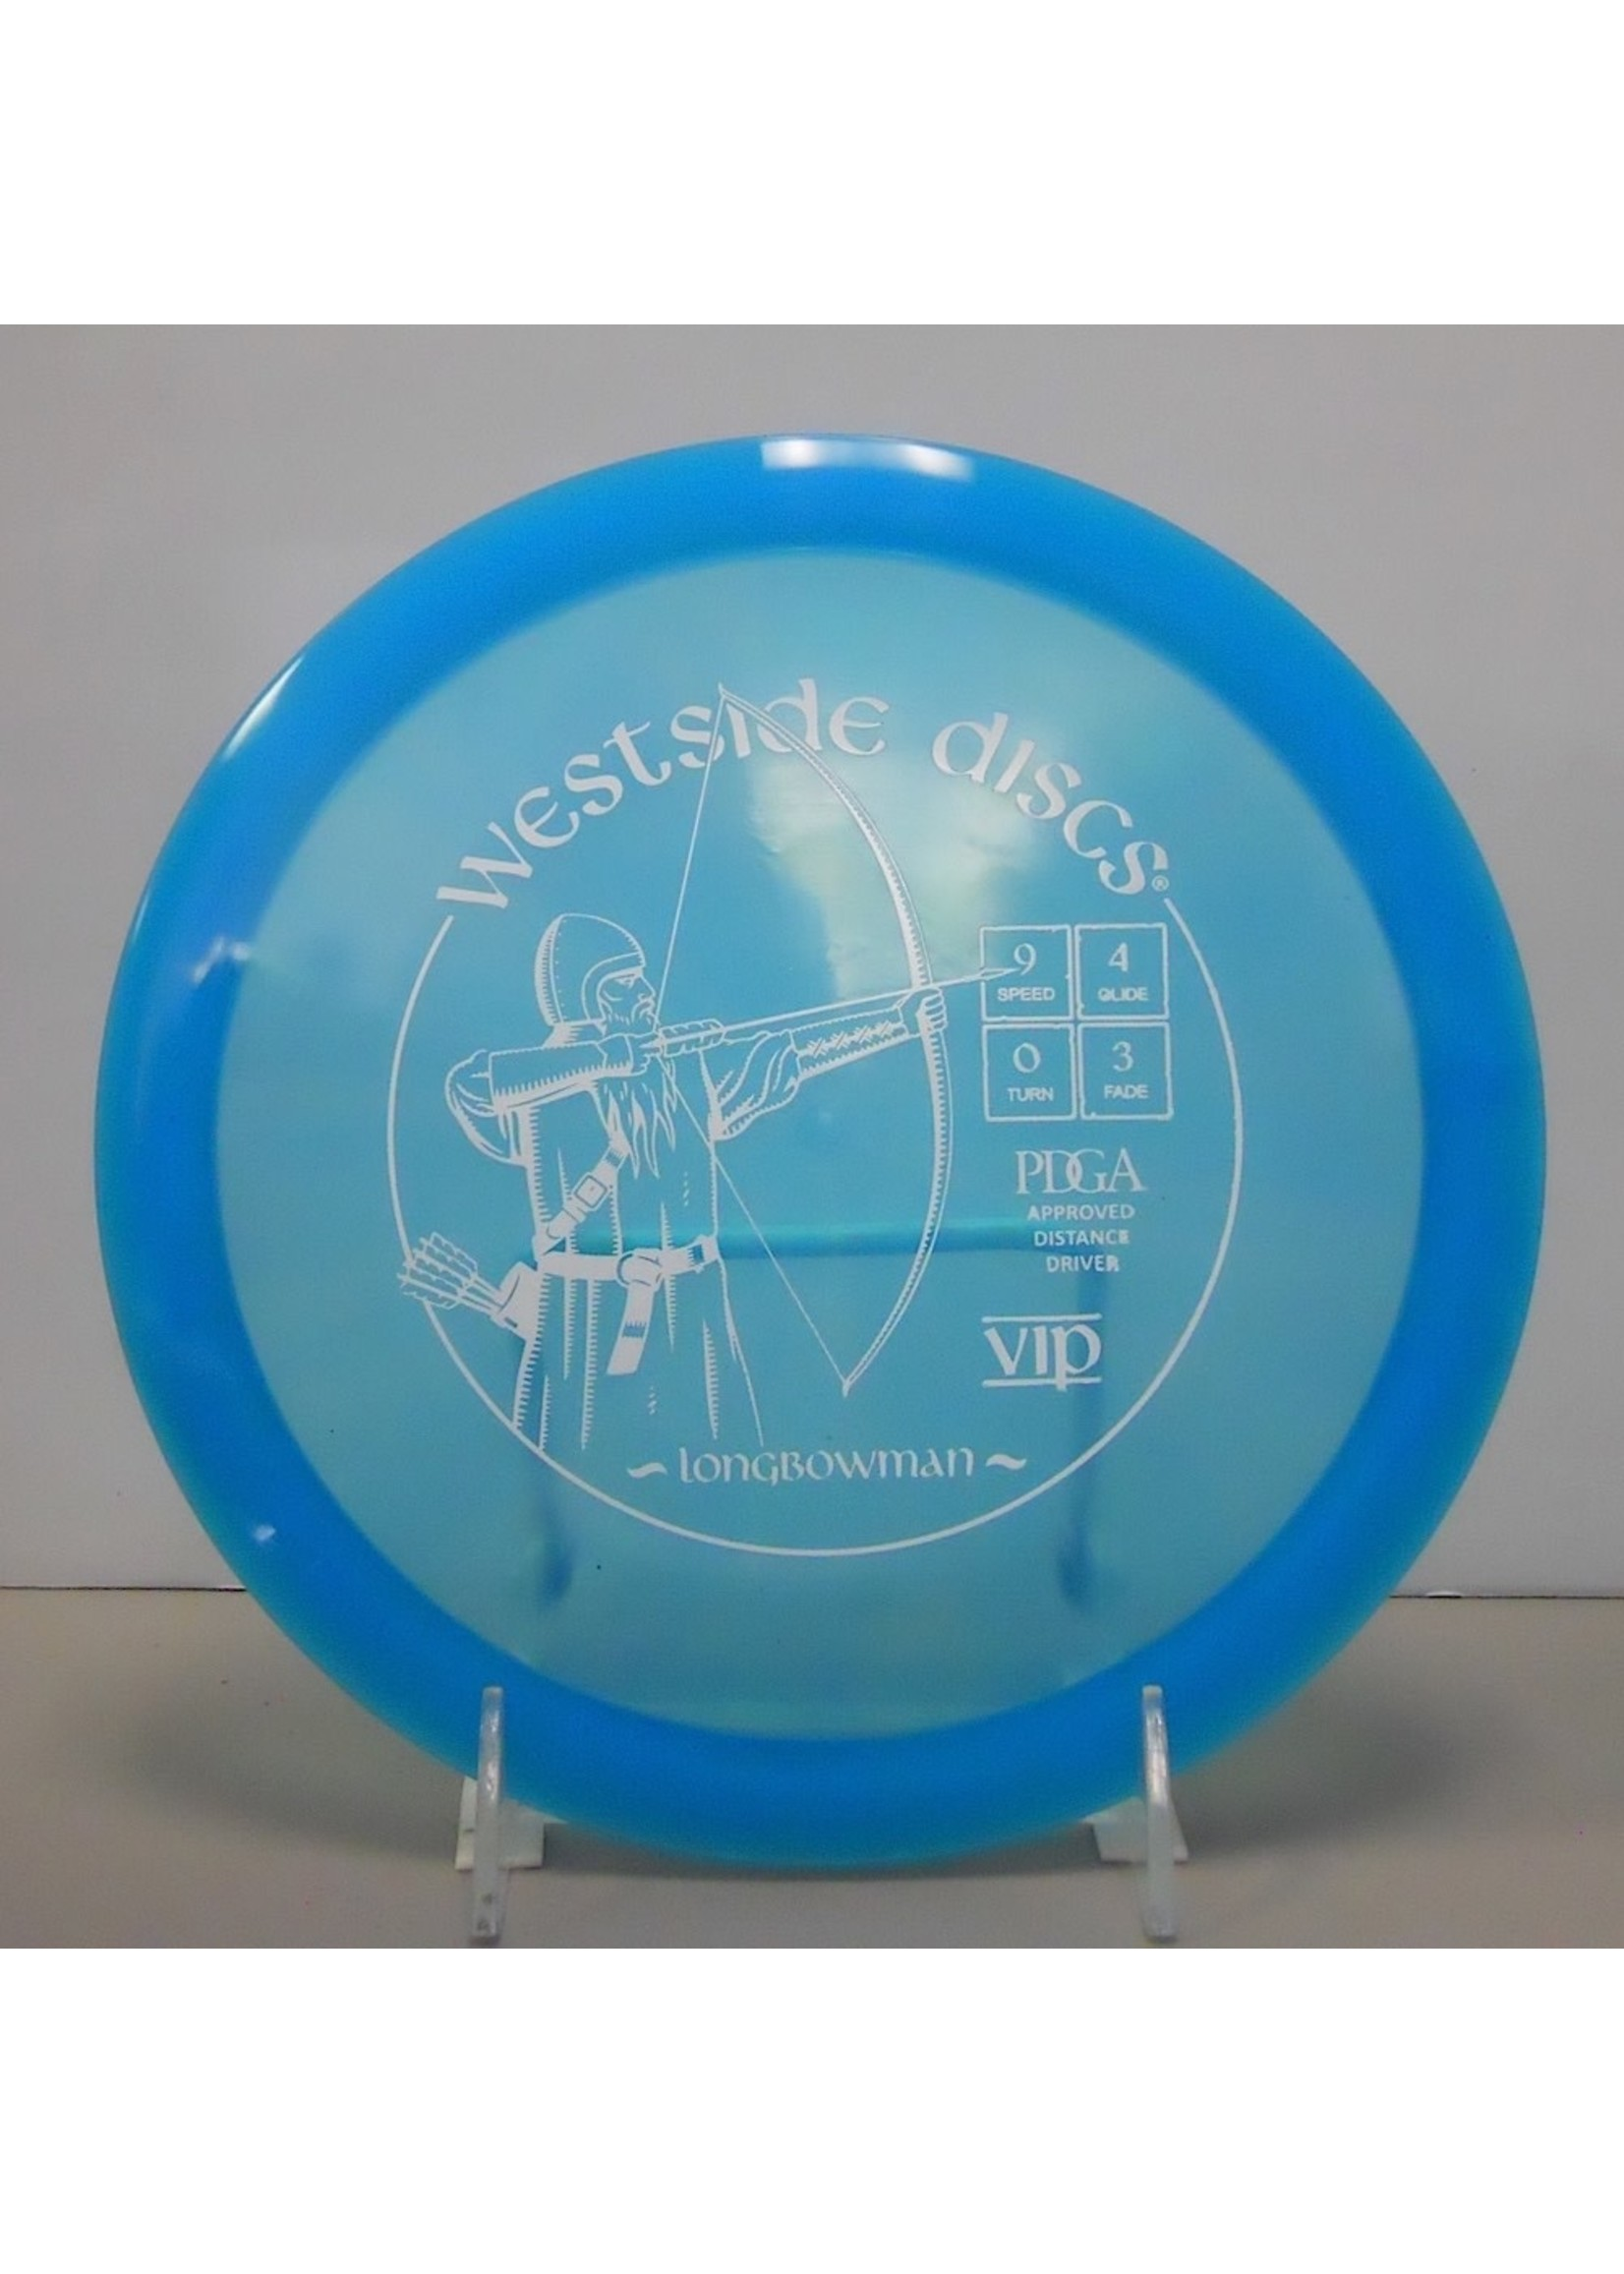 Westside Discs Westside Longbowman